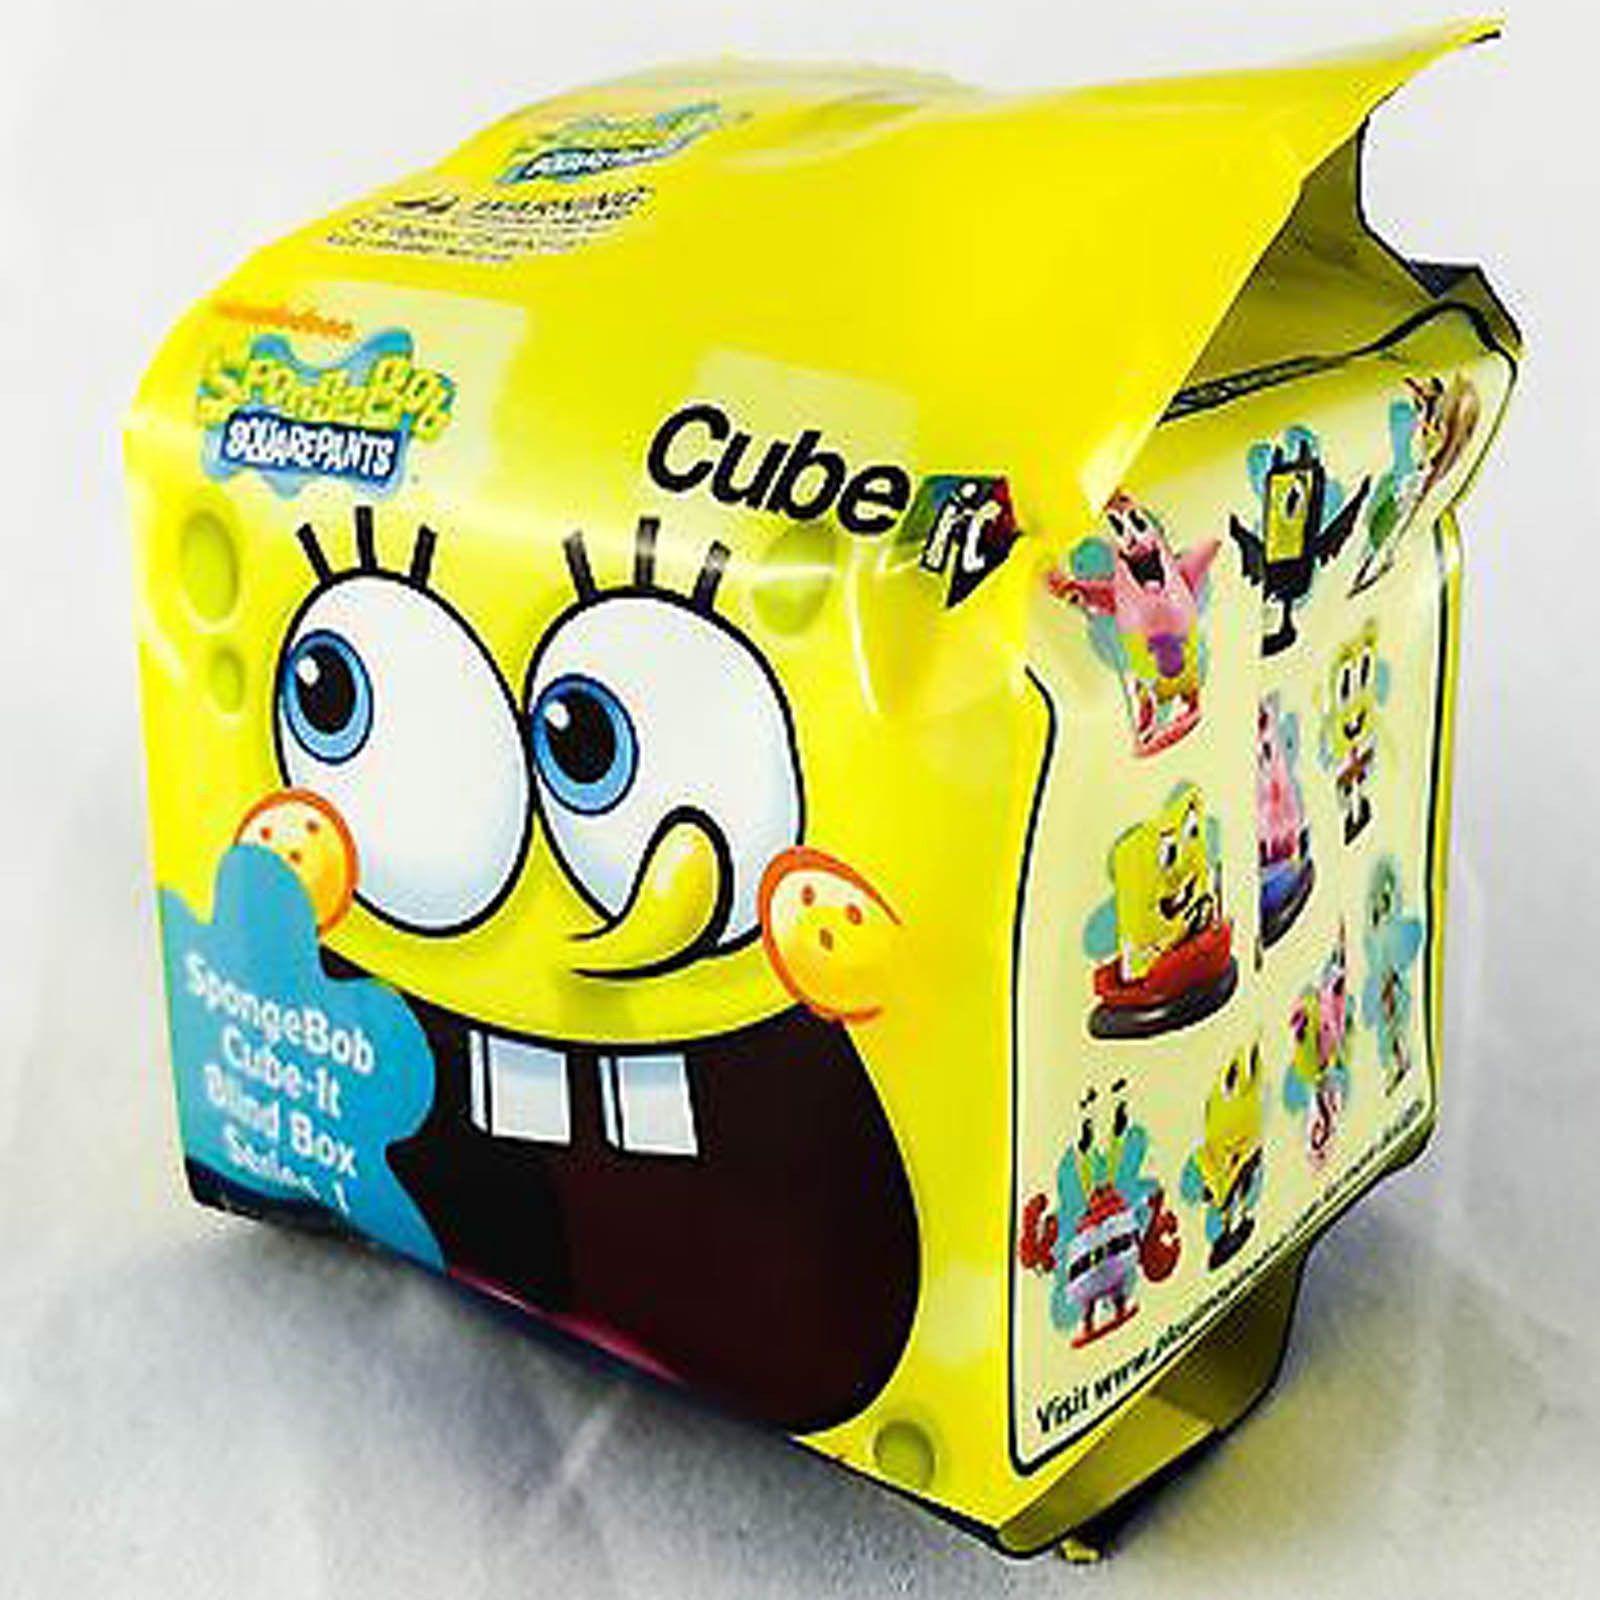 Spongebob squarepants cube it series 1 blind box mini figure radar toys 1